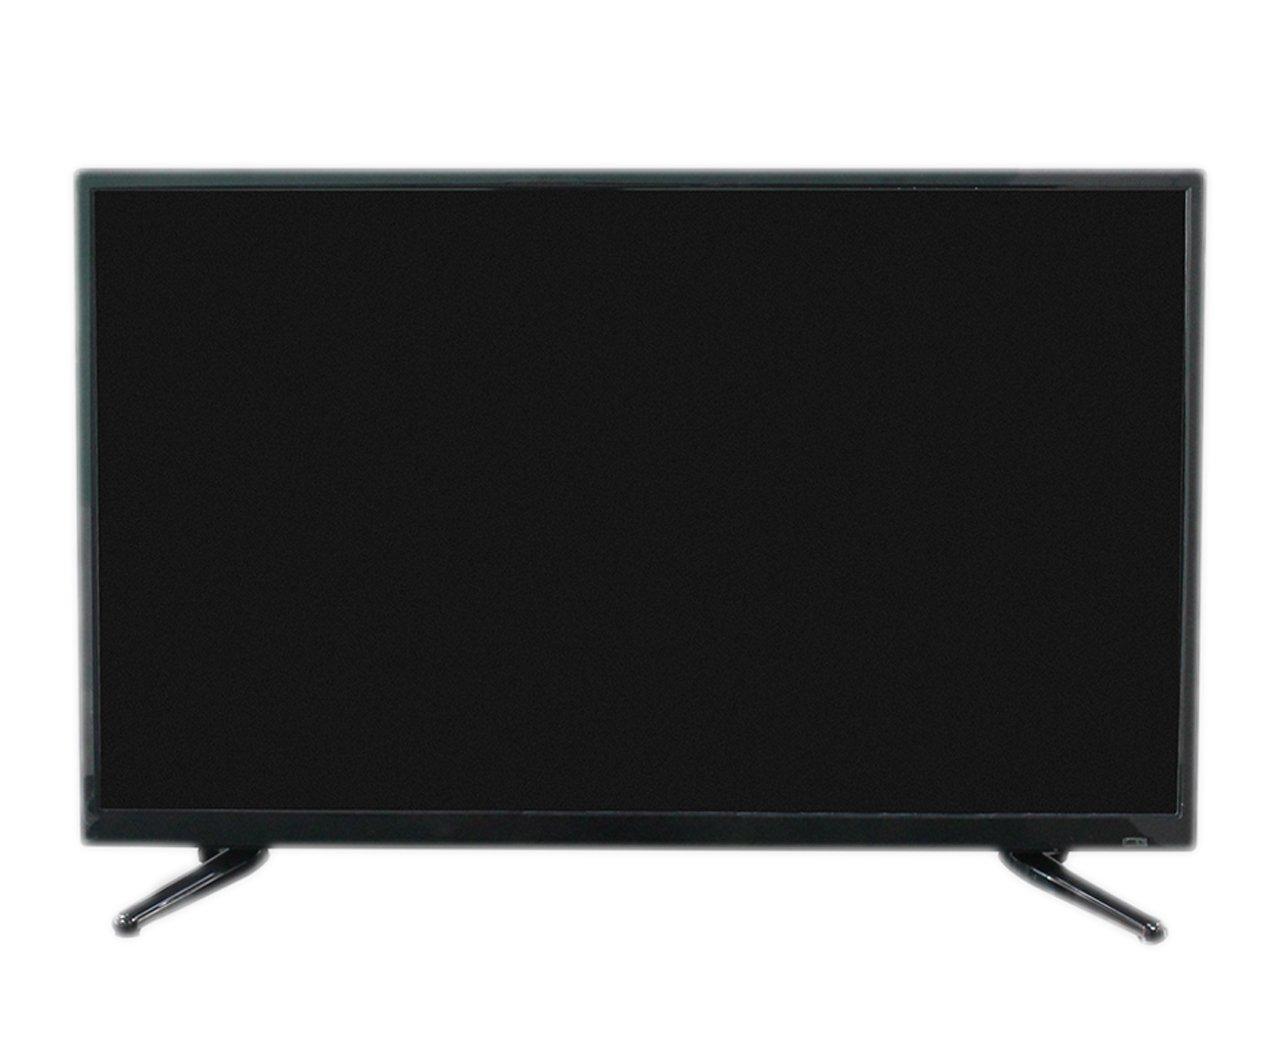 32V型USB録画付き 地上デジタルハイビジョン液晶テレビ(BML付き) LE-3210TS B075B57D2X